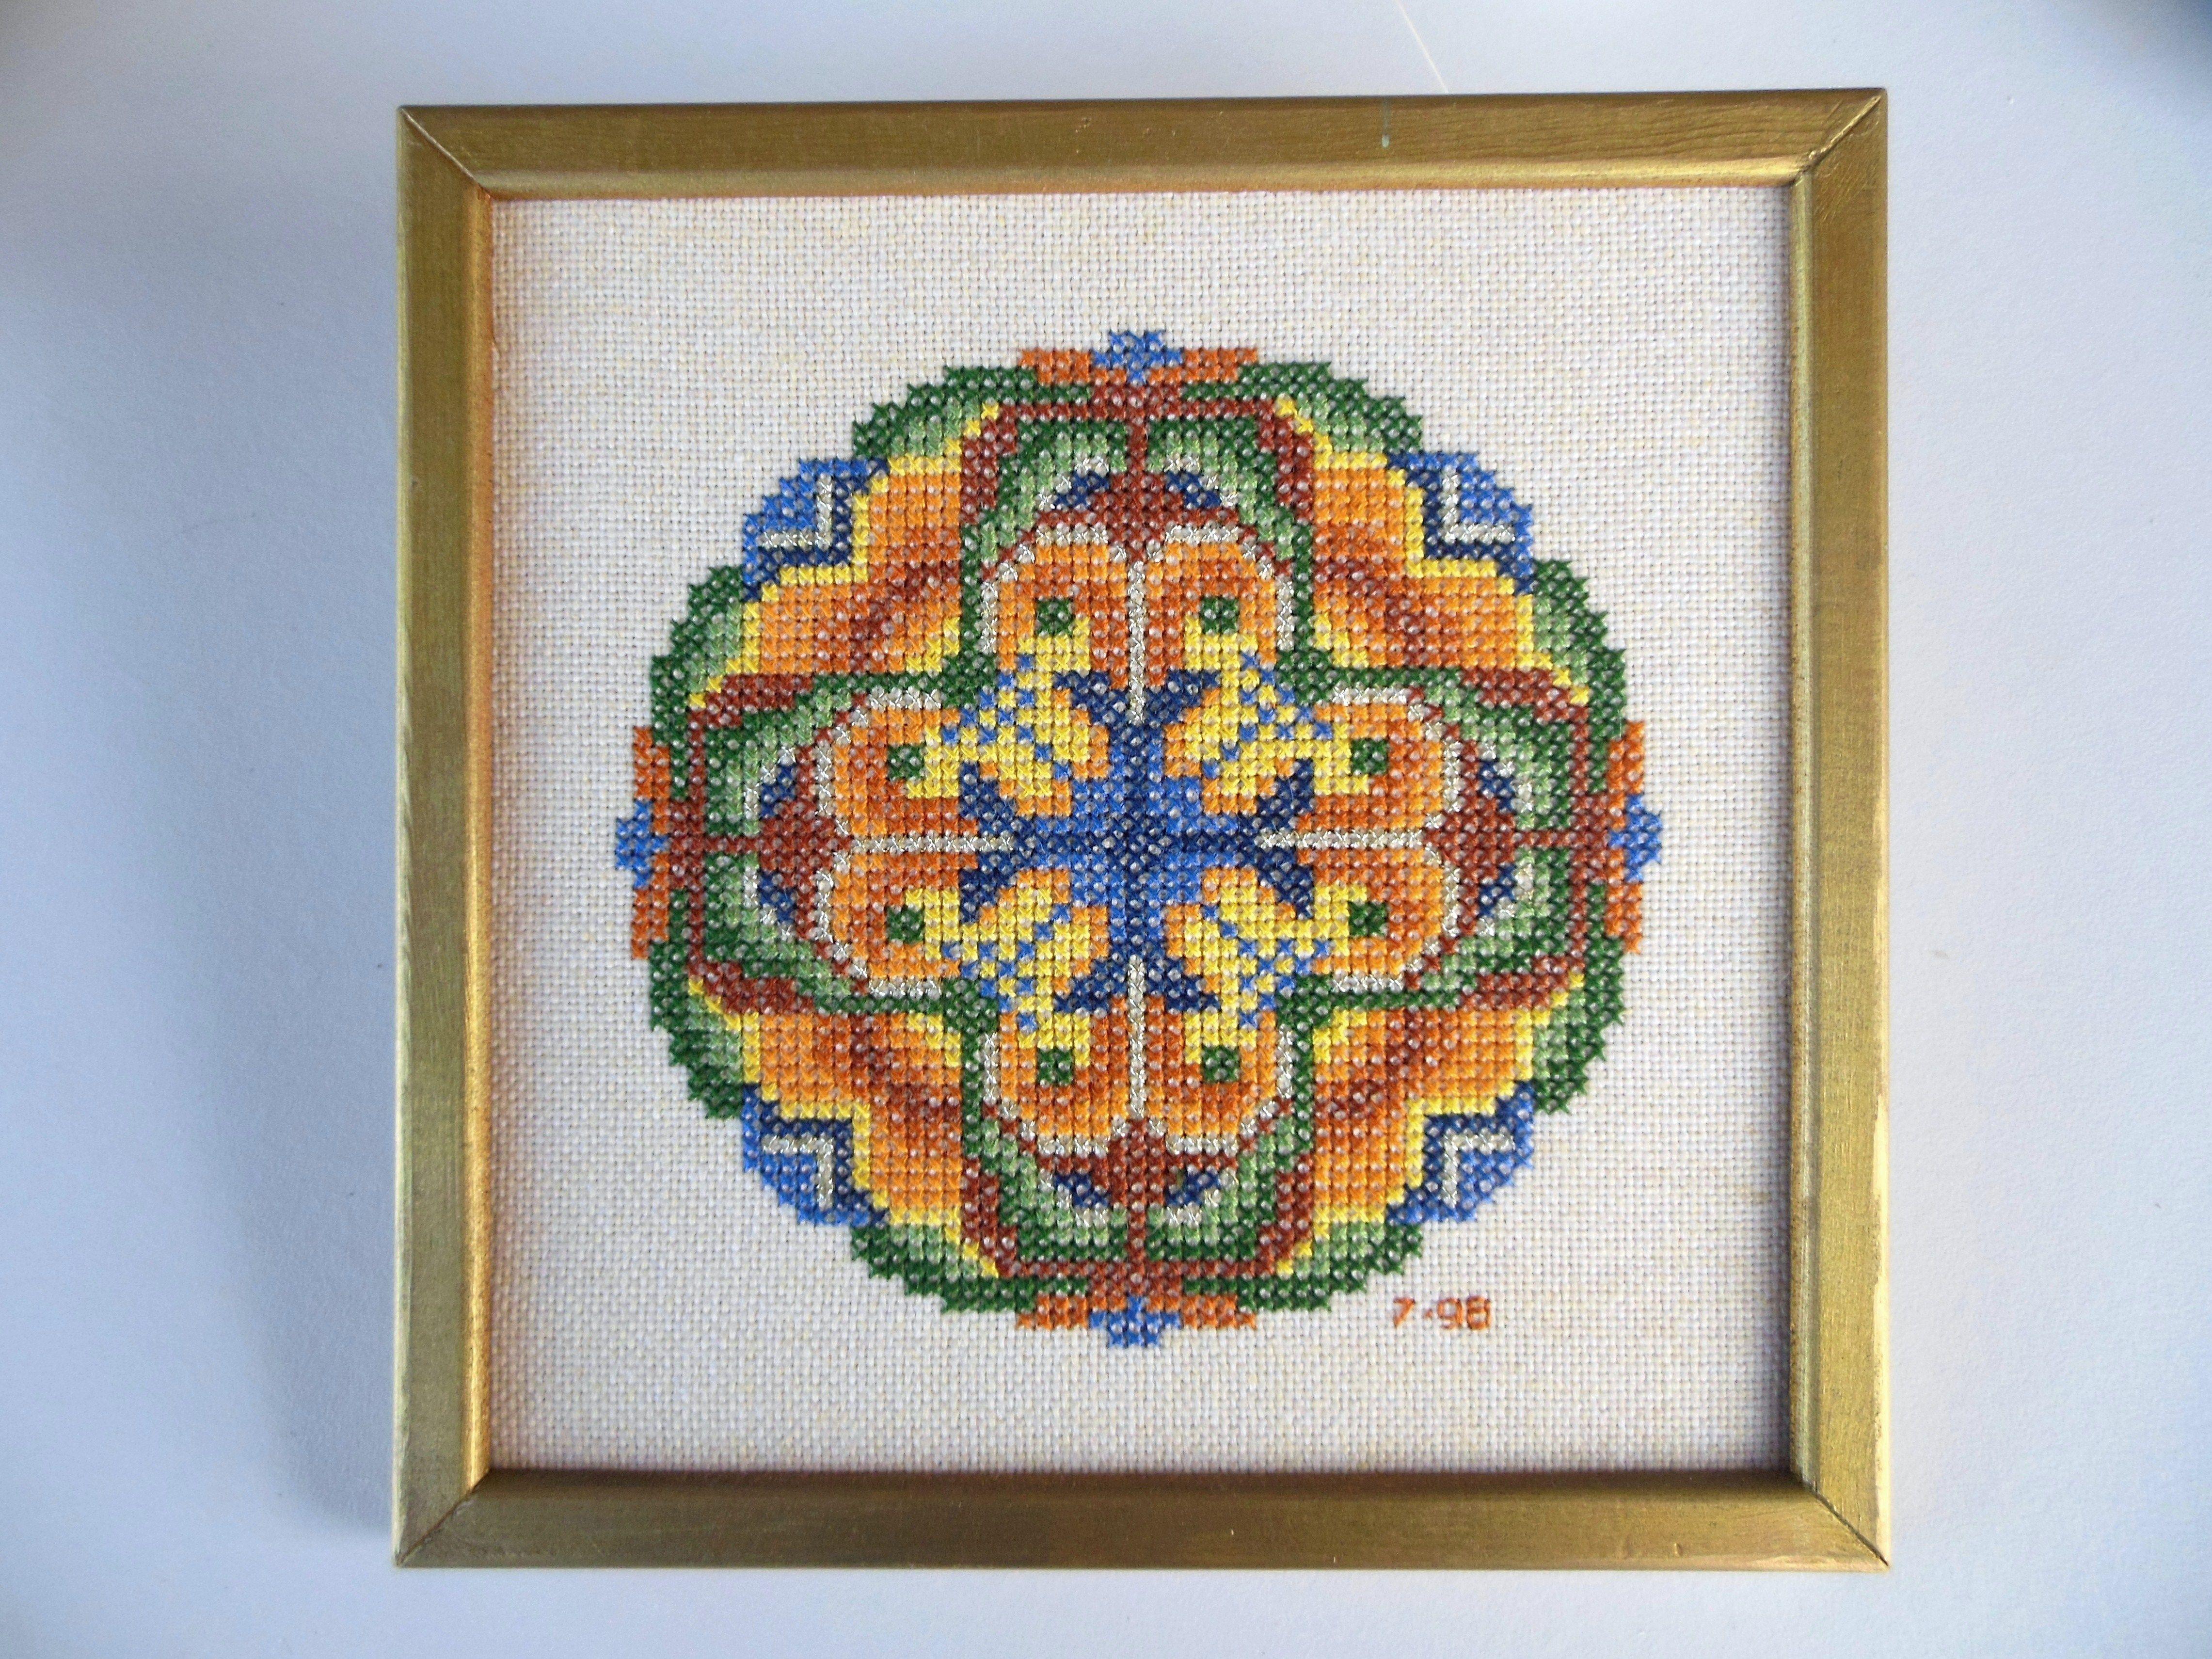 \u201cSpring\u201d Instant Download 11\u201d diameter Counted Cross-Stitch Pattern; Mandala for DMC floss